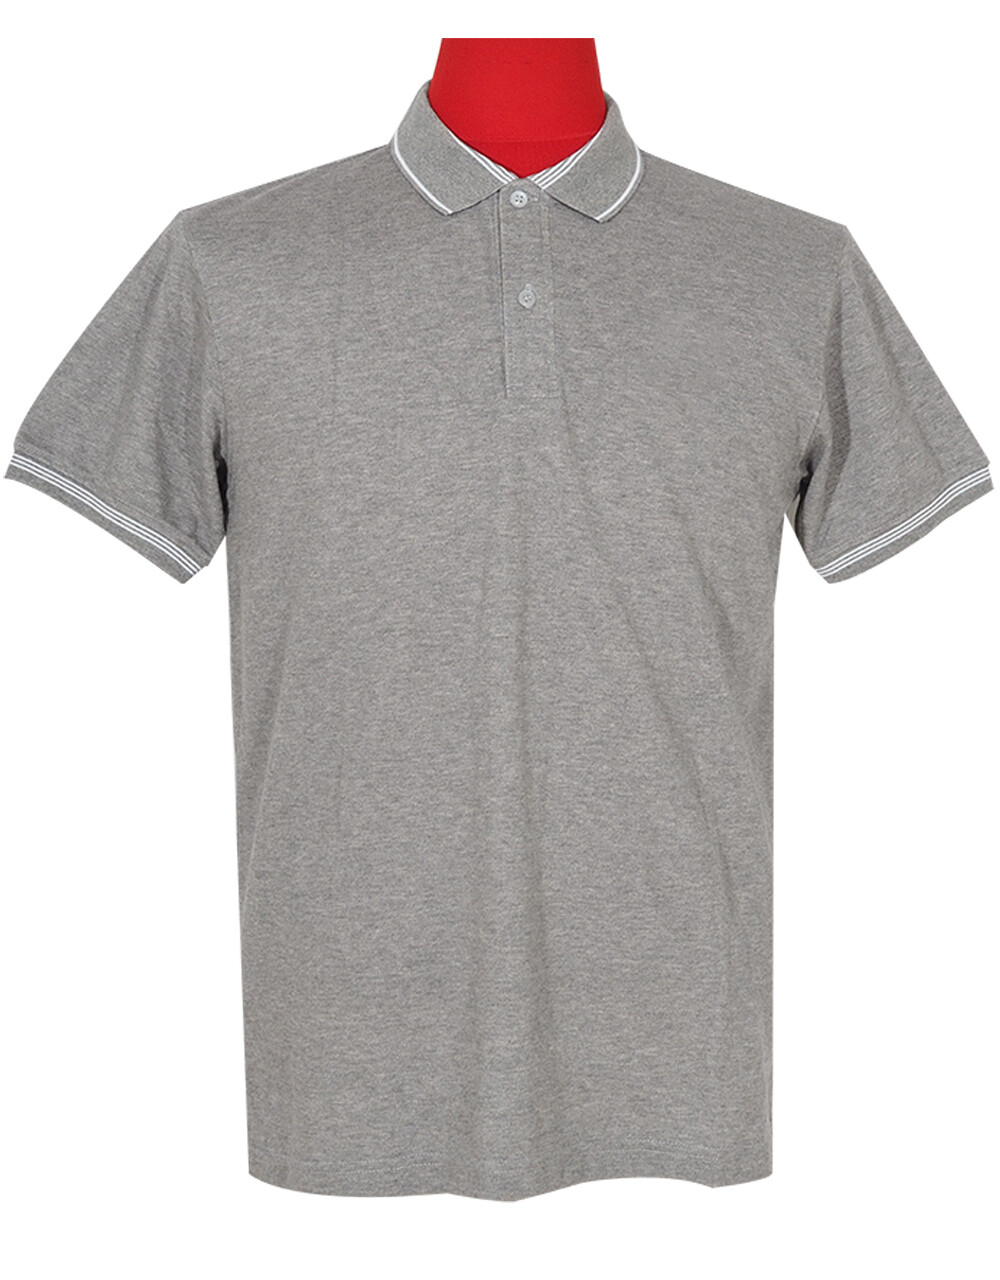 Polo Shirt Fabric Cool Plus Colour Grey  Polo Shirt